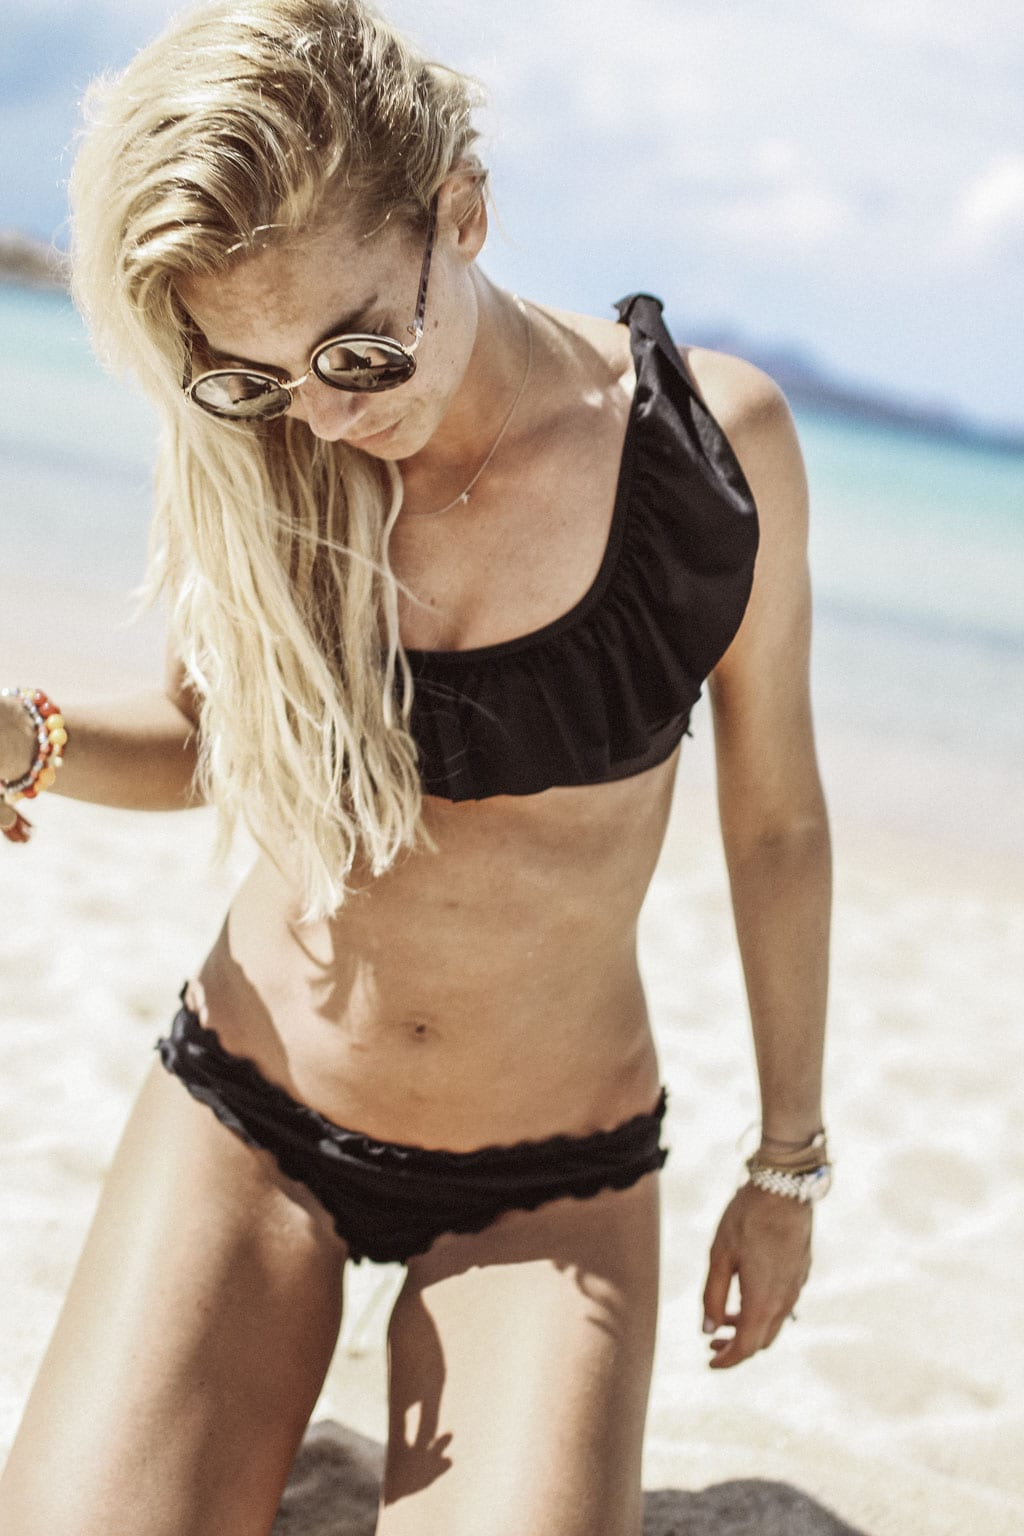 CK-1606_Sardinien-Sardegna-Sardinia-Italy-Italia-Fashion-Blog-Beach-Caribbean-Dress-Blonde-Karin-Kaswurm-Bikini-Kiini-9756